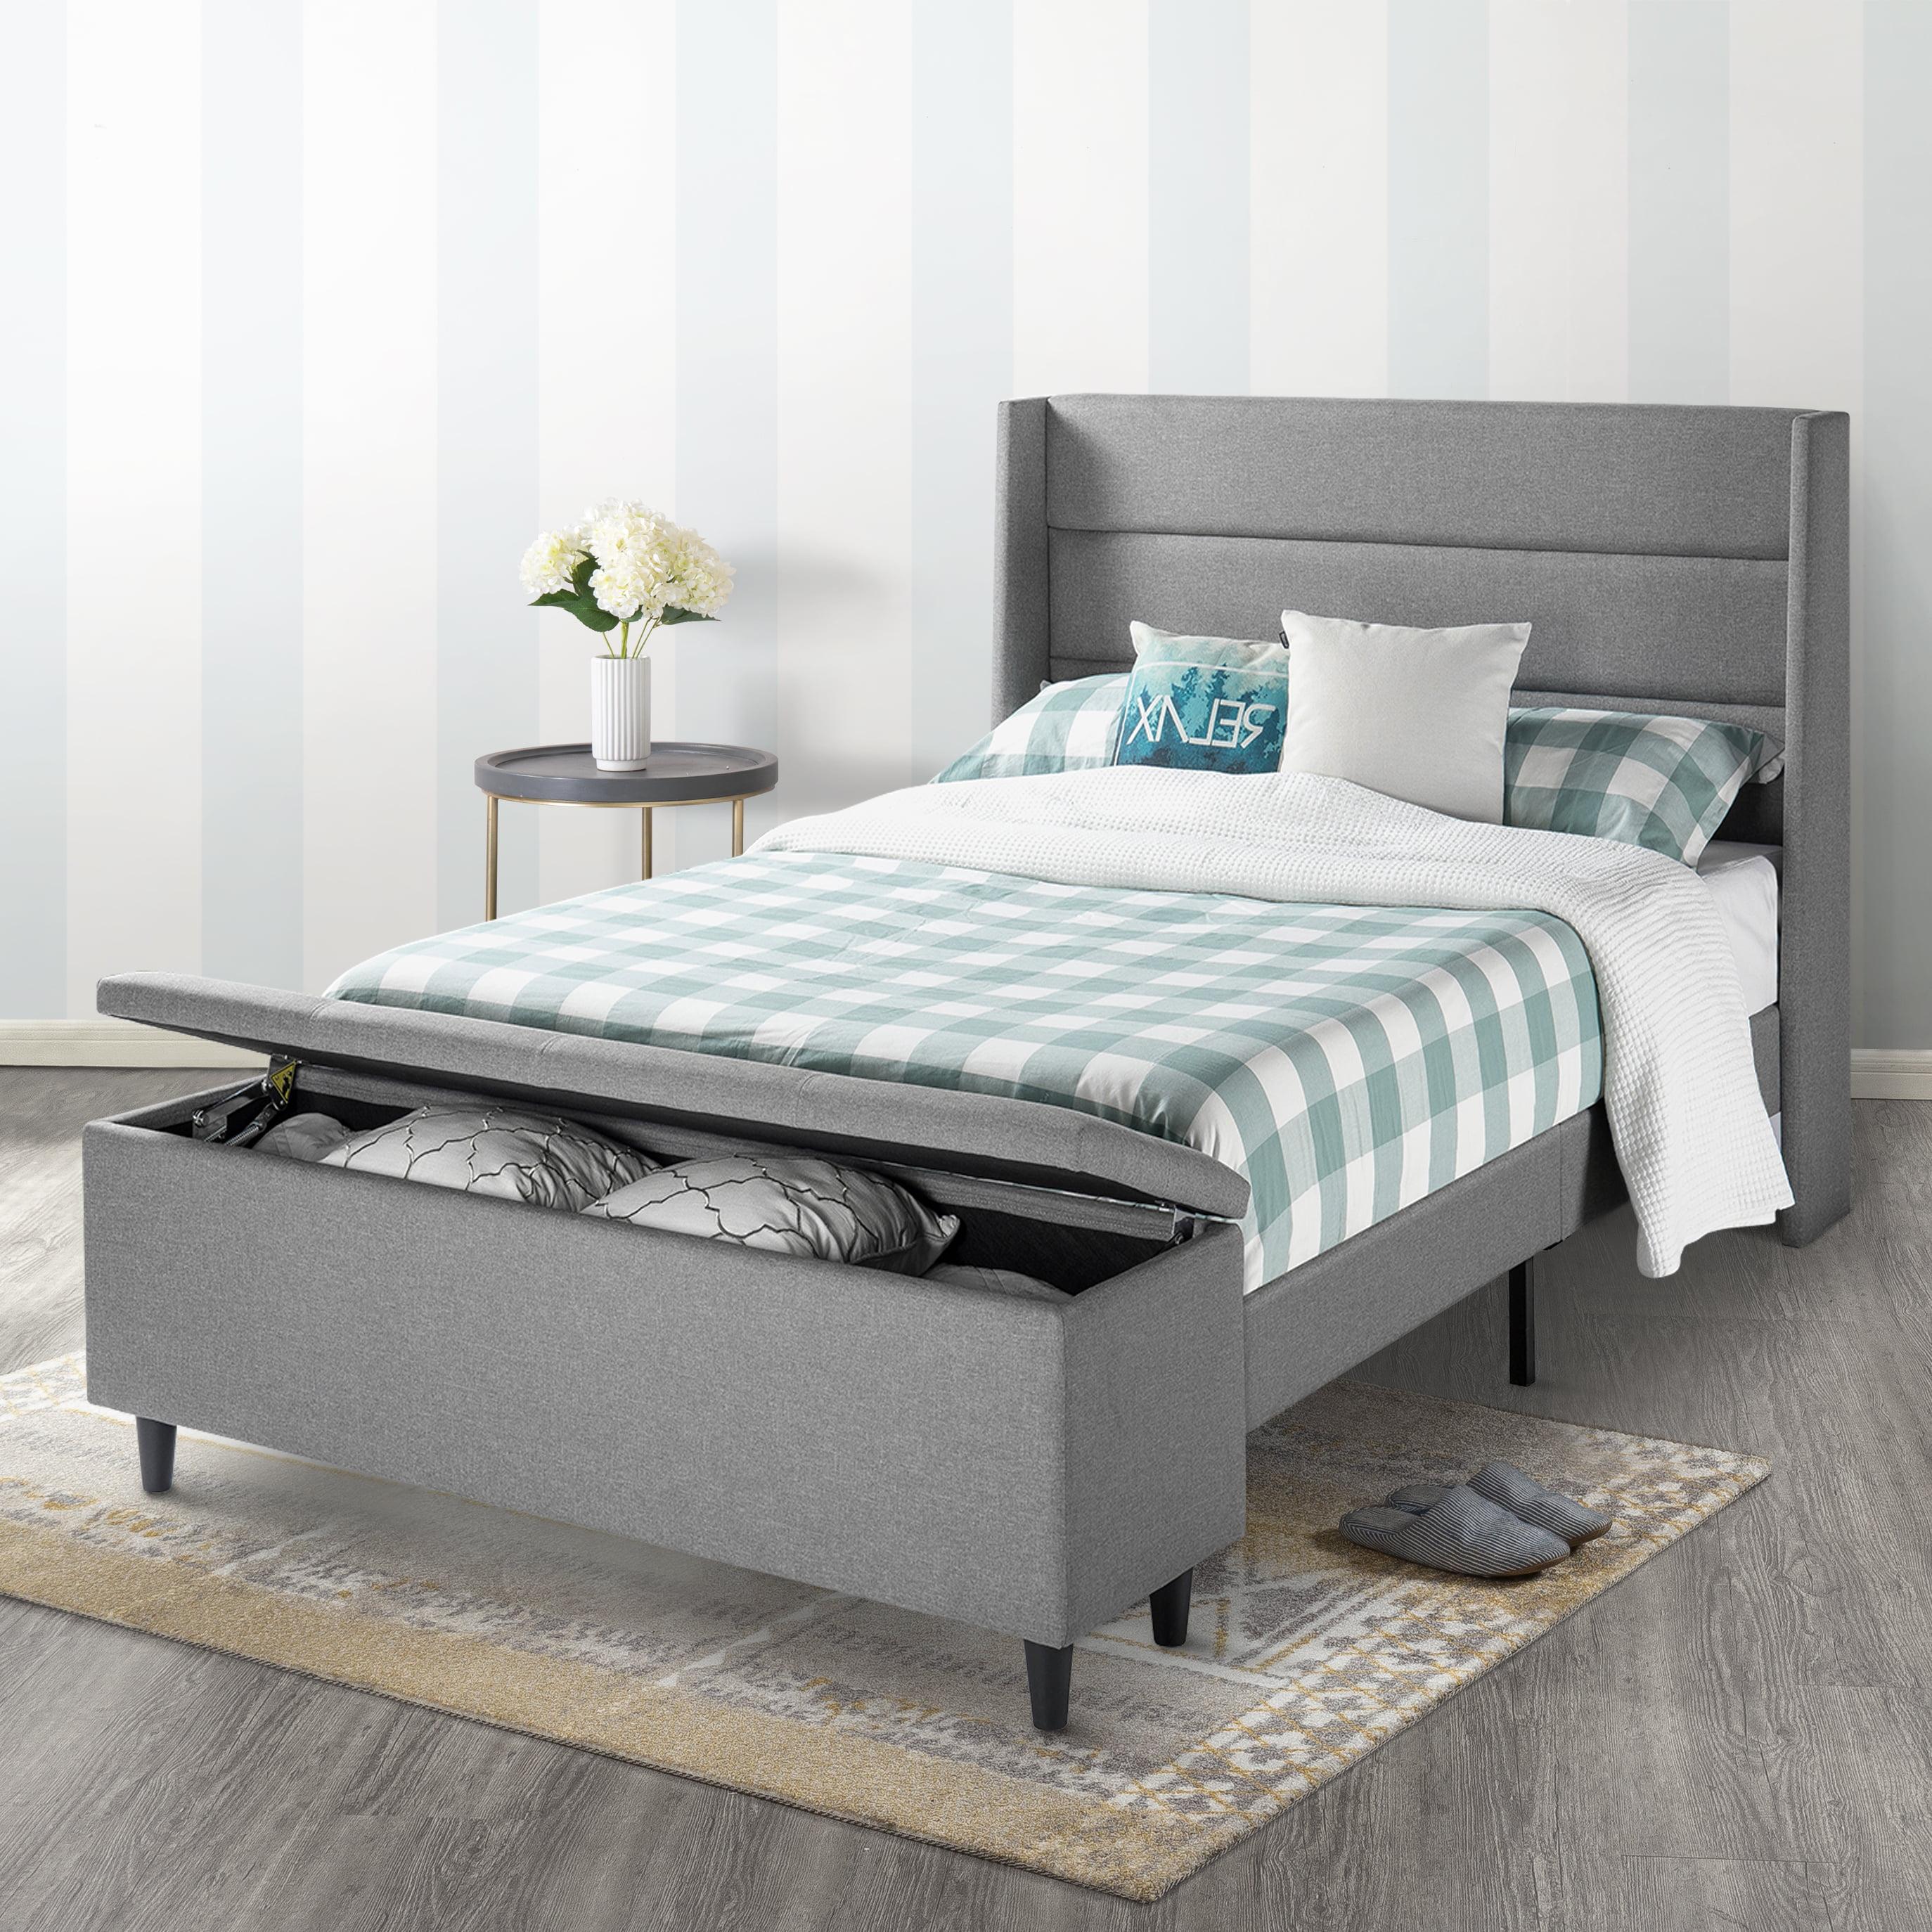 Modern Upholstered Platform Bed With Headboard Walmart Com Walmart Com